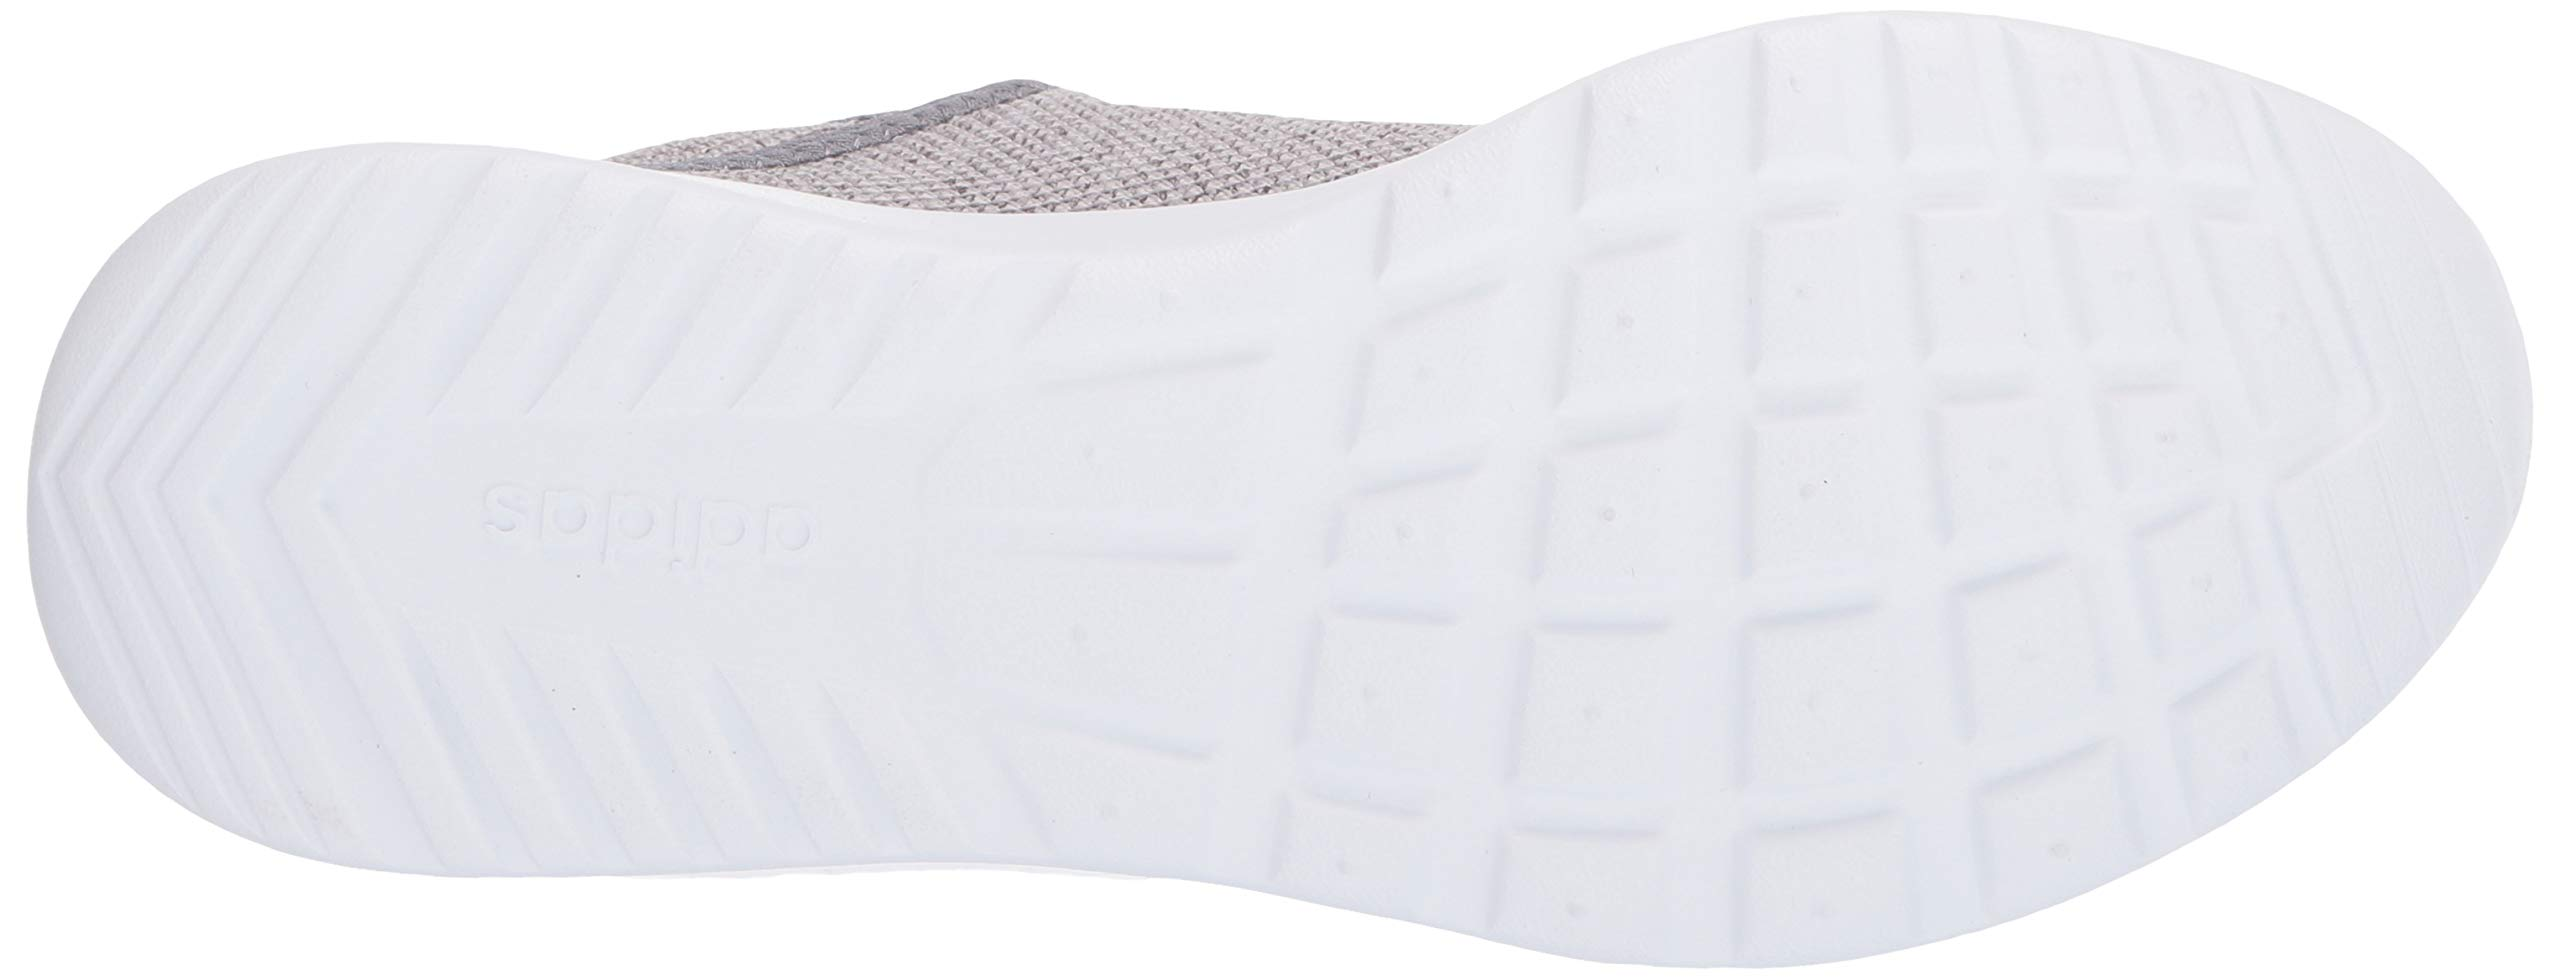 adidas Women's Cloudfoam Pure, Grey/True Pink, 5.5 M US by adidas (Image #3)